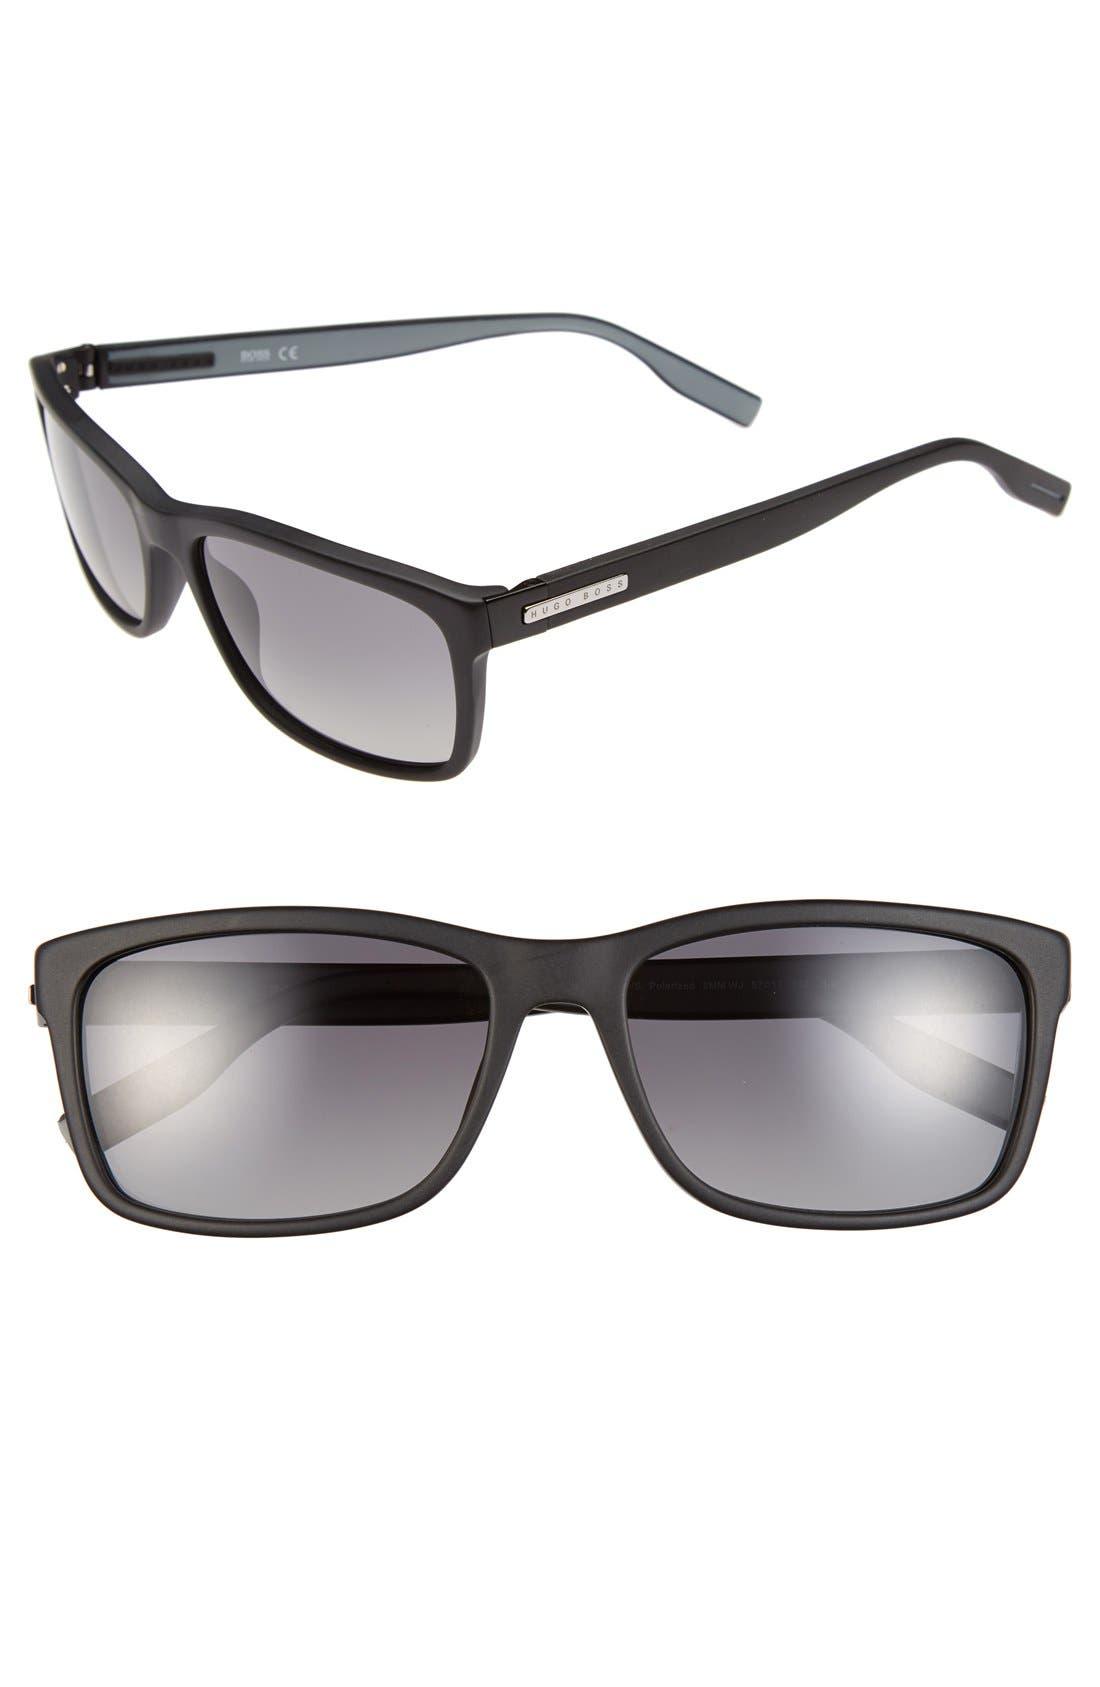 57mm Polarized Retro Sunglasses,                             Main thumbnail 1, color,                             001